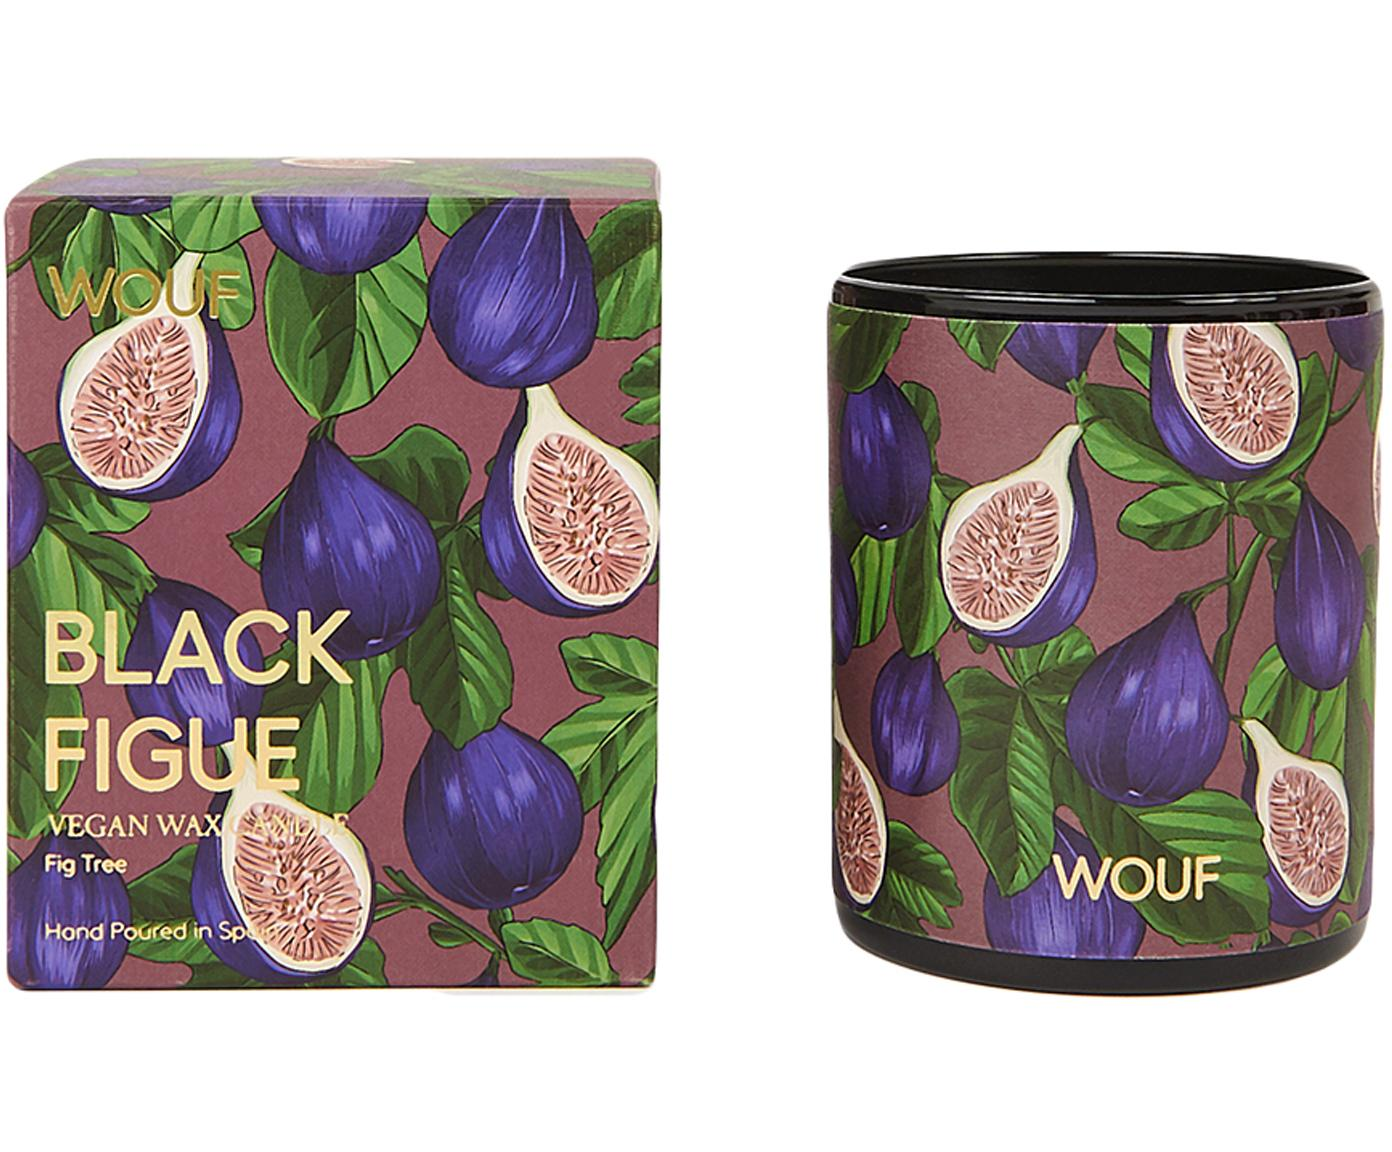 Geurkaars Black Figue (vijgenboom), Vegetarische was, glas, Multicolour, Ø 8 x H 10 cm